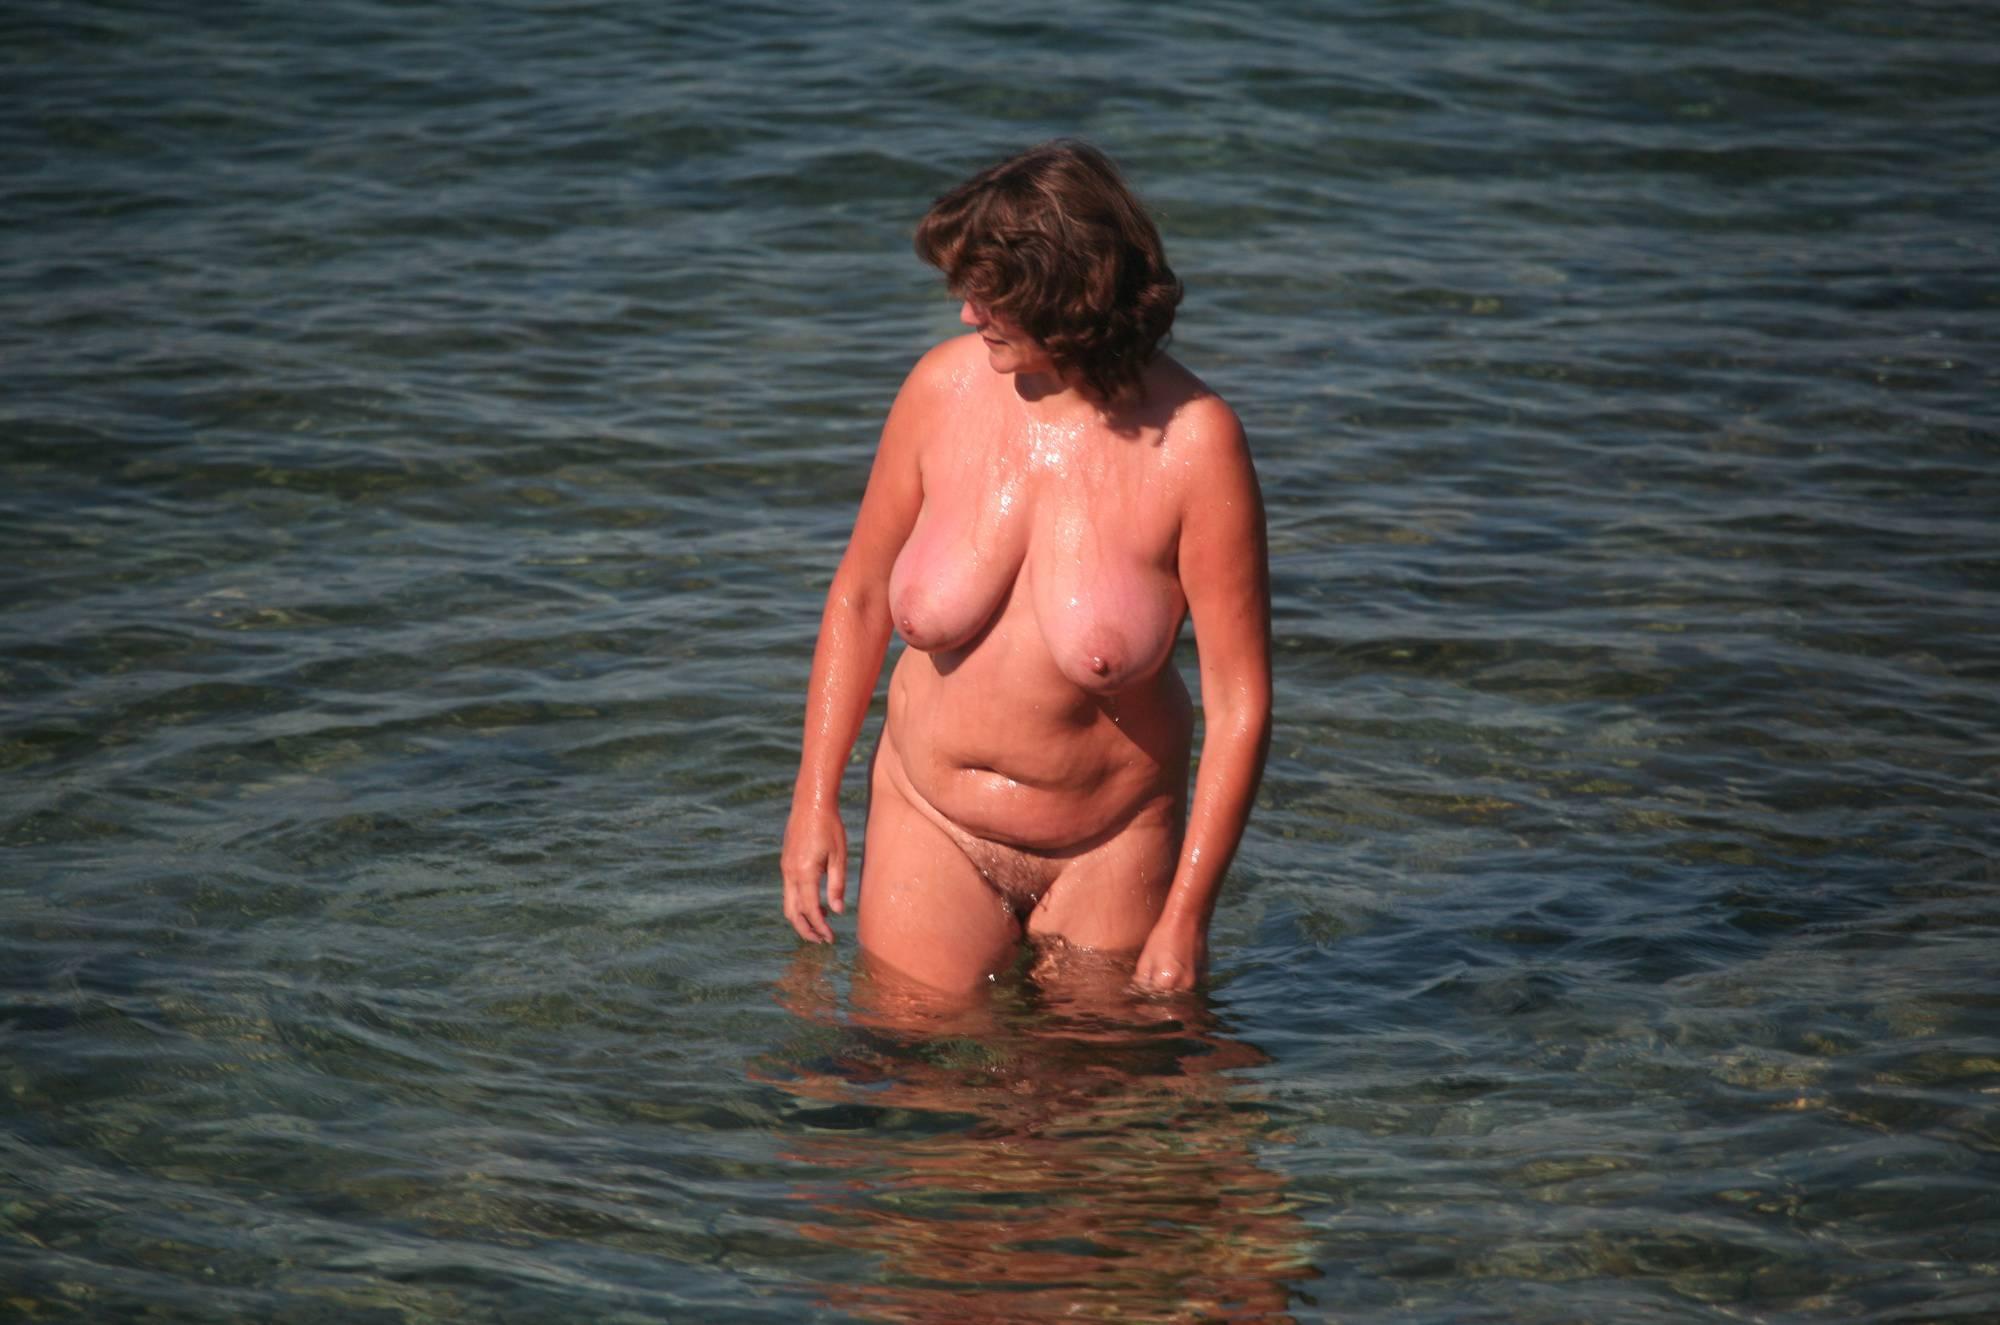 Nudist Gallery Crete Dog-Bathing Woman - 1